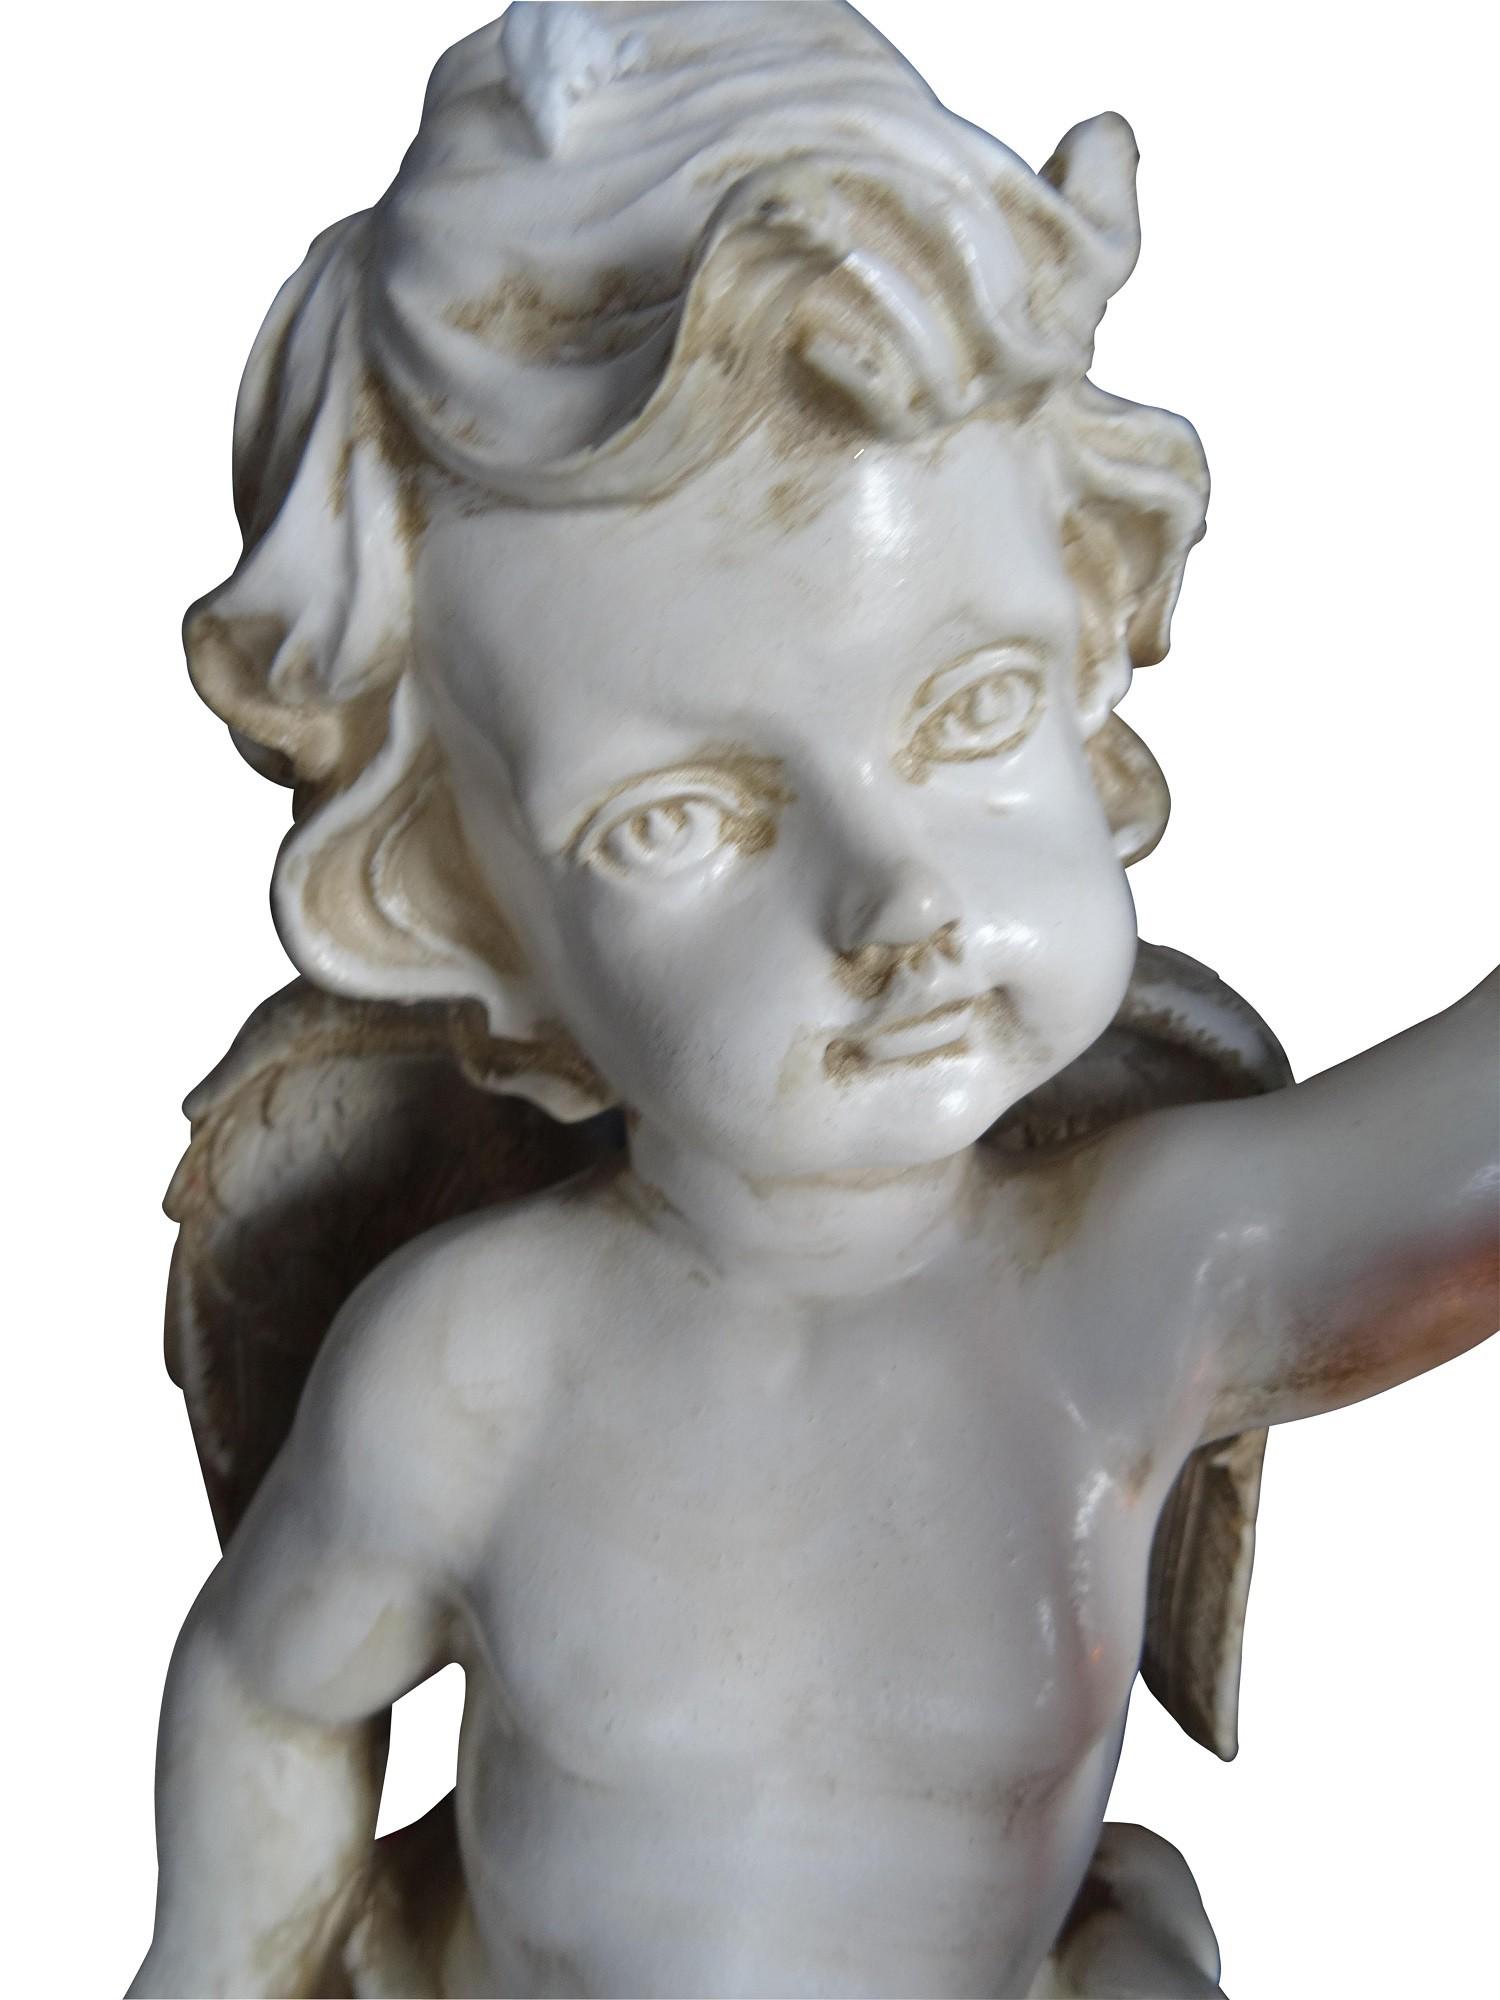 engel statue figuren garten figur engel mit laterne. Black Bedroom Furniture Sets. Home Design Ideas